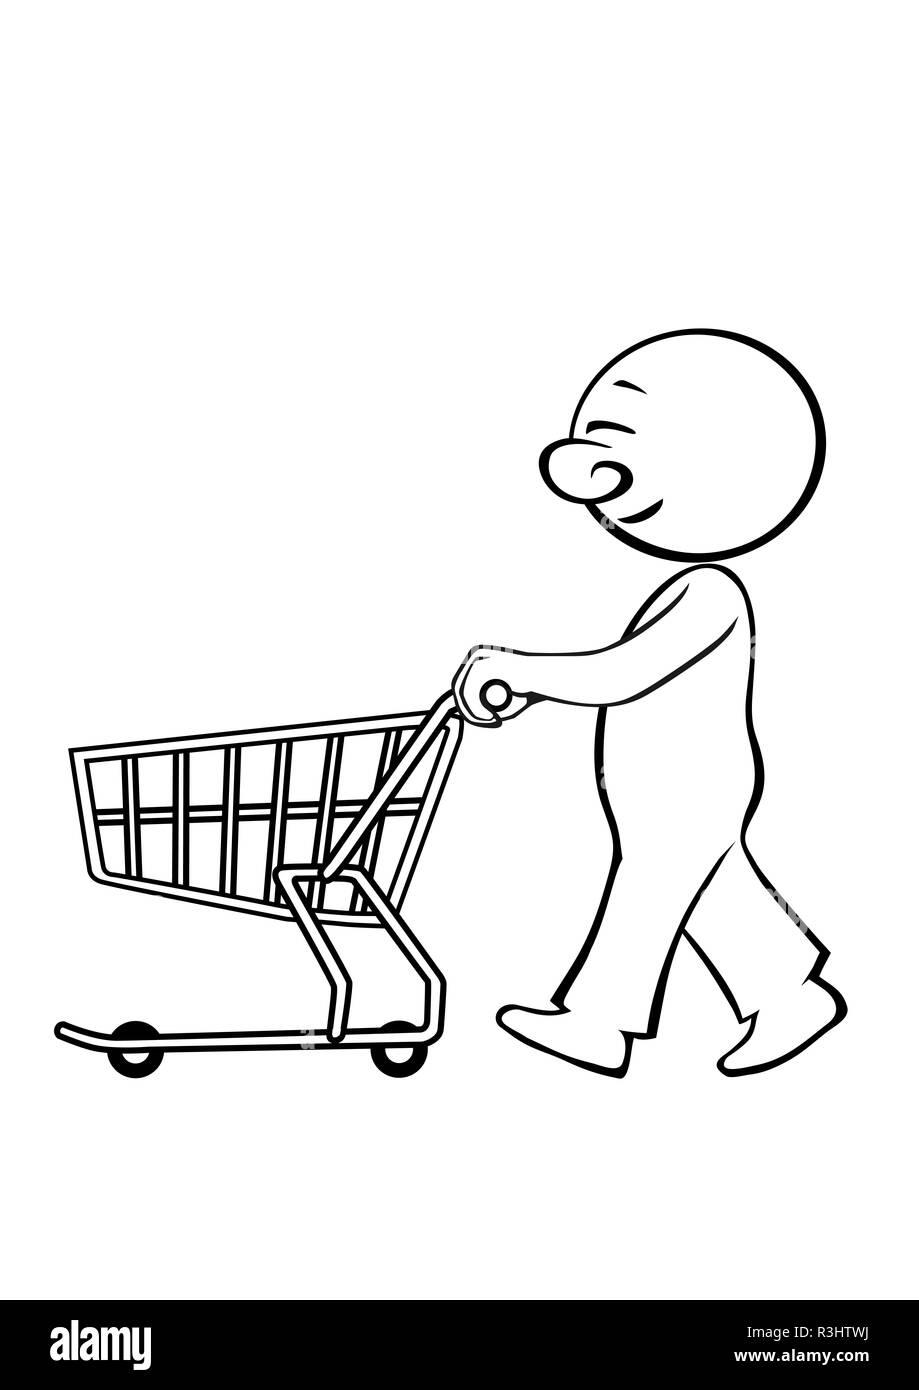 heribert11 shopping - Stock Image